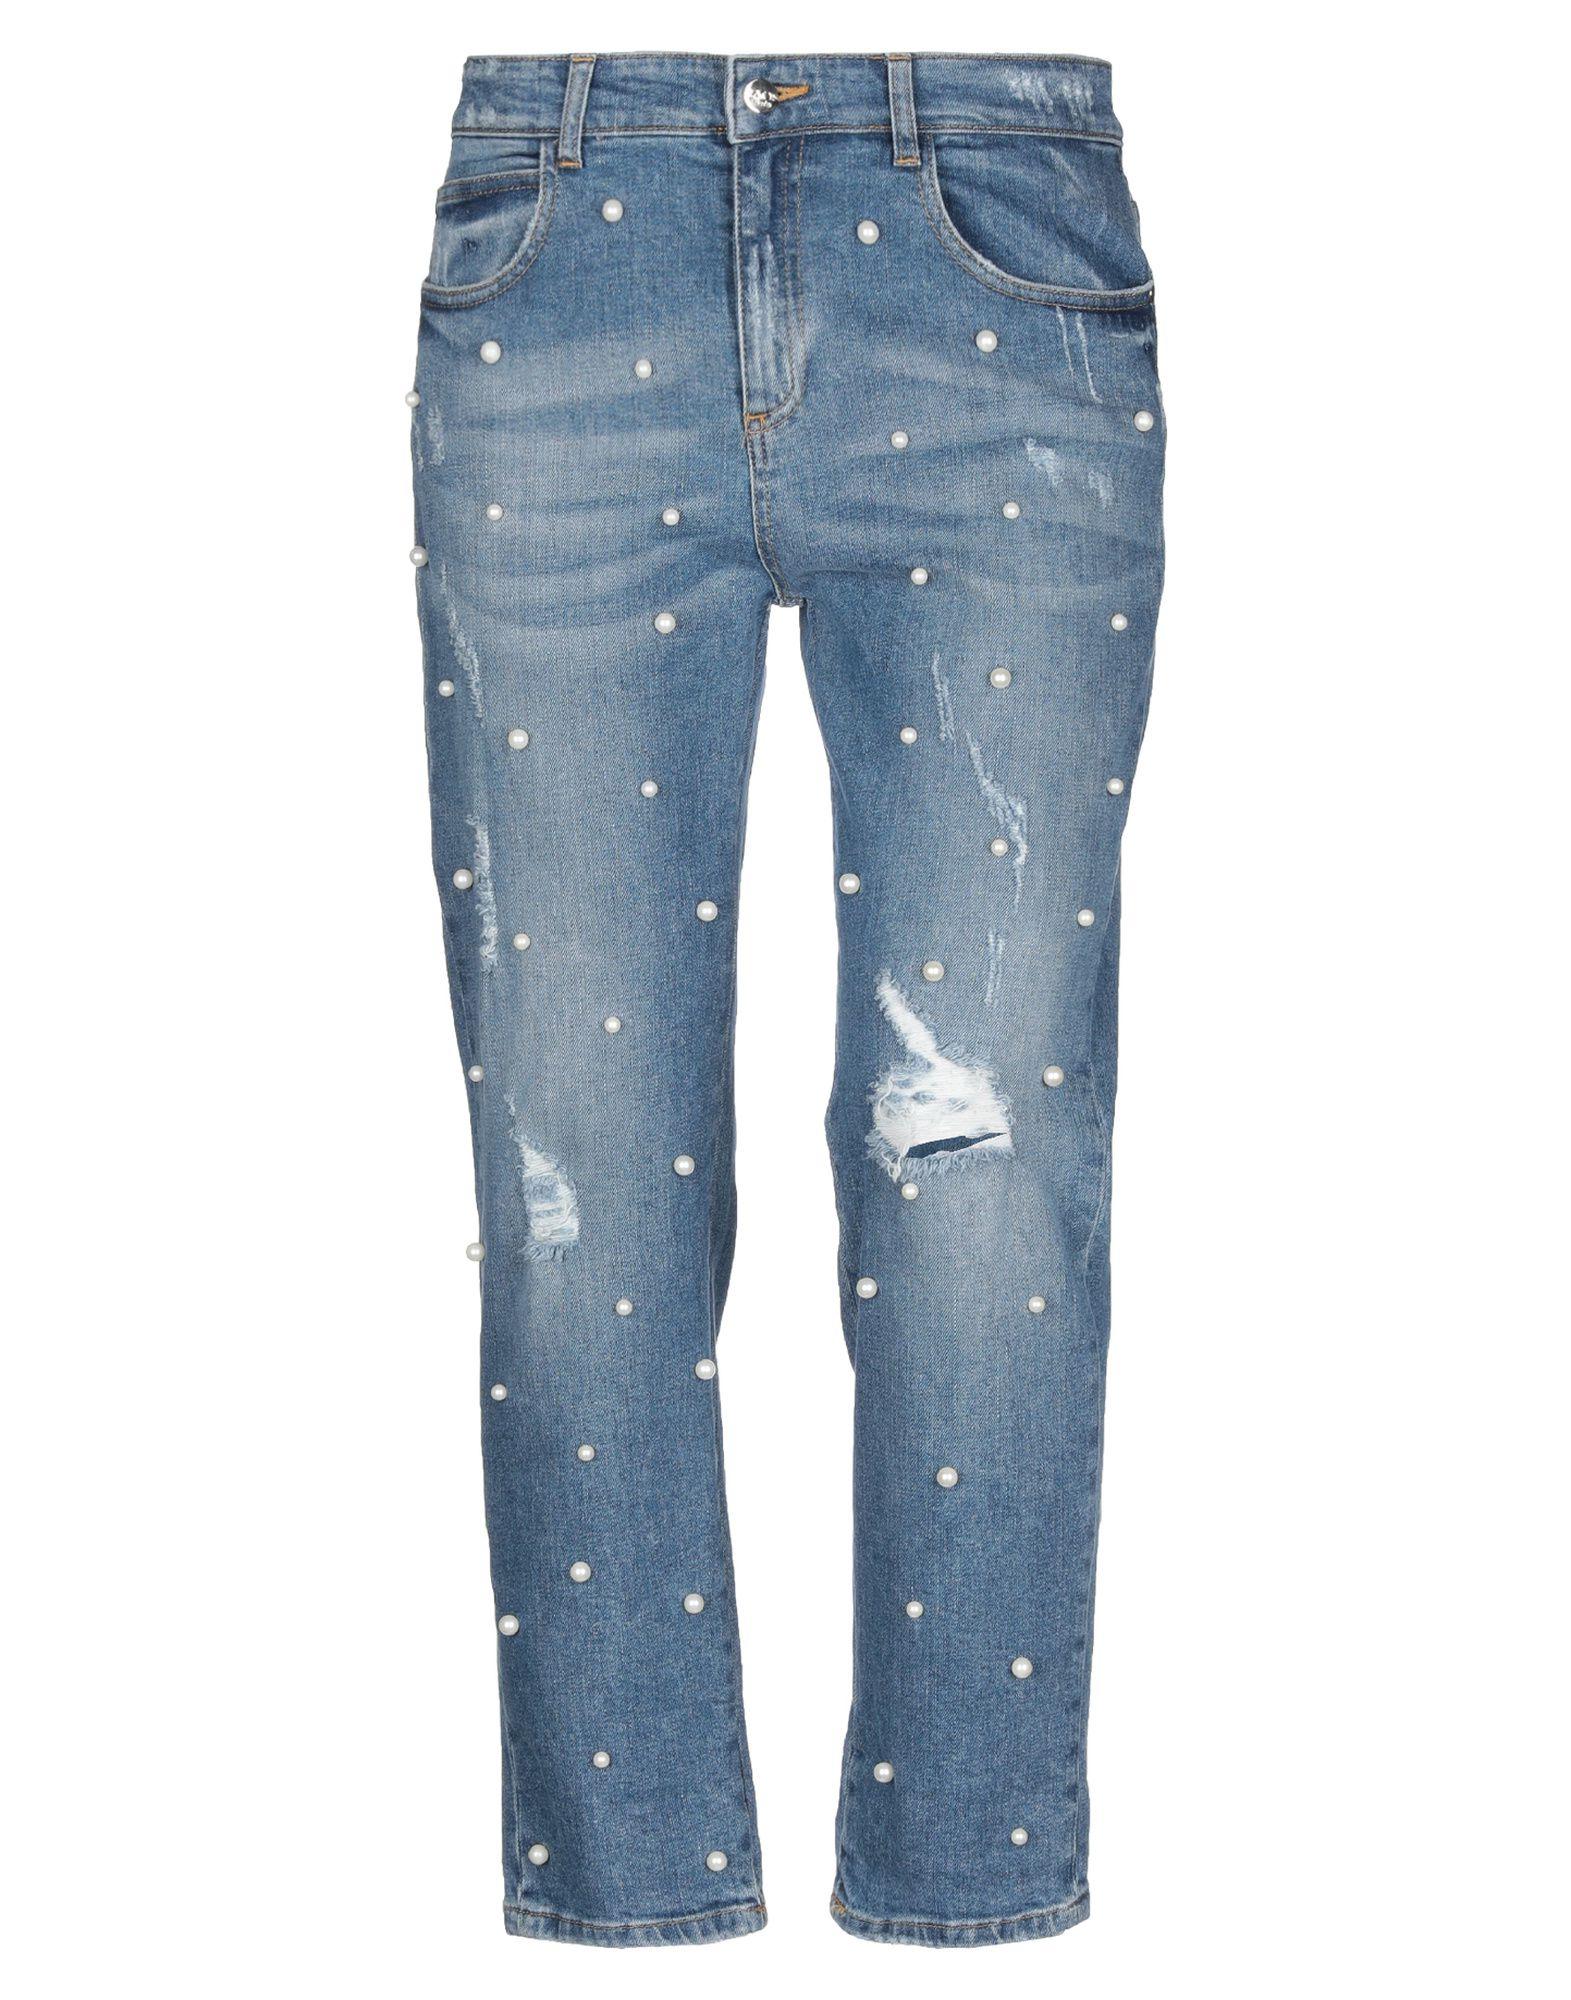 KAOS JEANS Джинсовые брюки summer boyfriend jeans for women hole ripped white lace flowers denim pants low waist mujer vintage skinny stretch jeans female